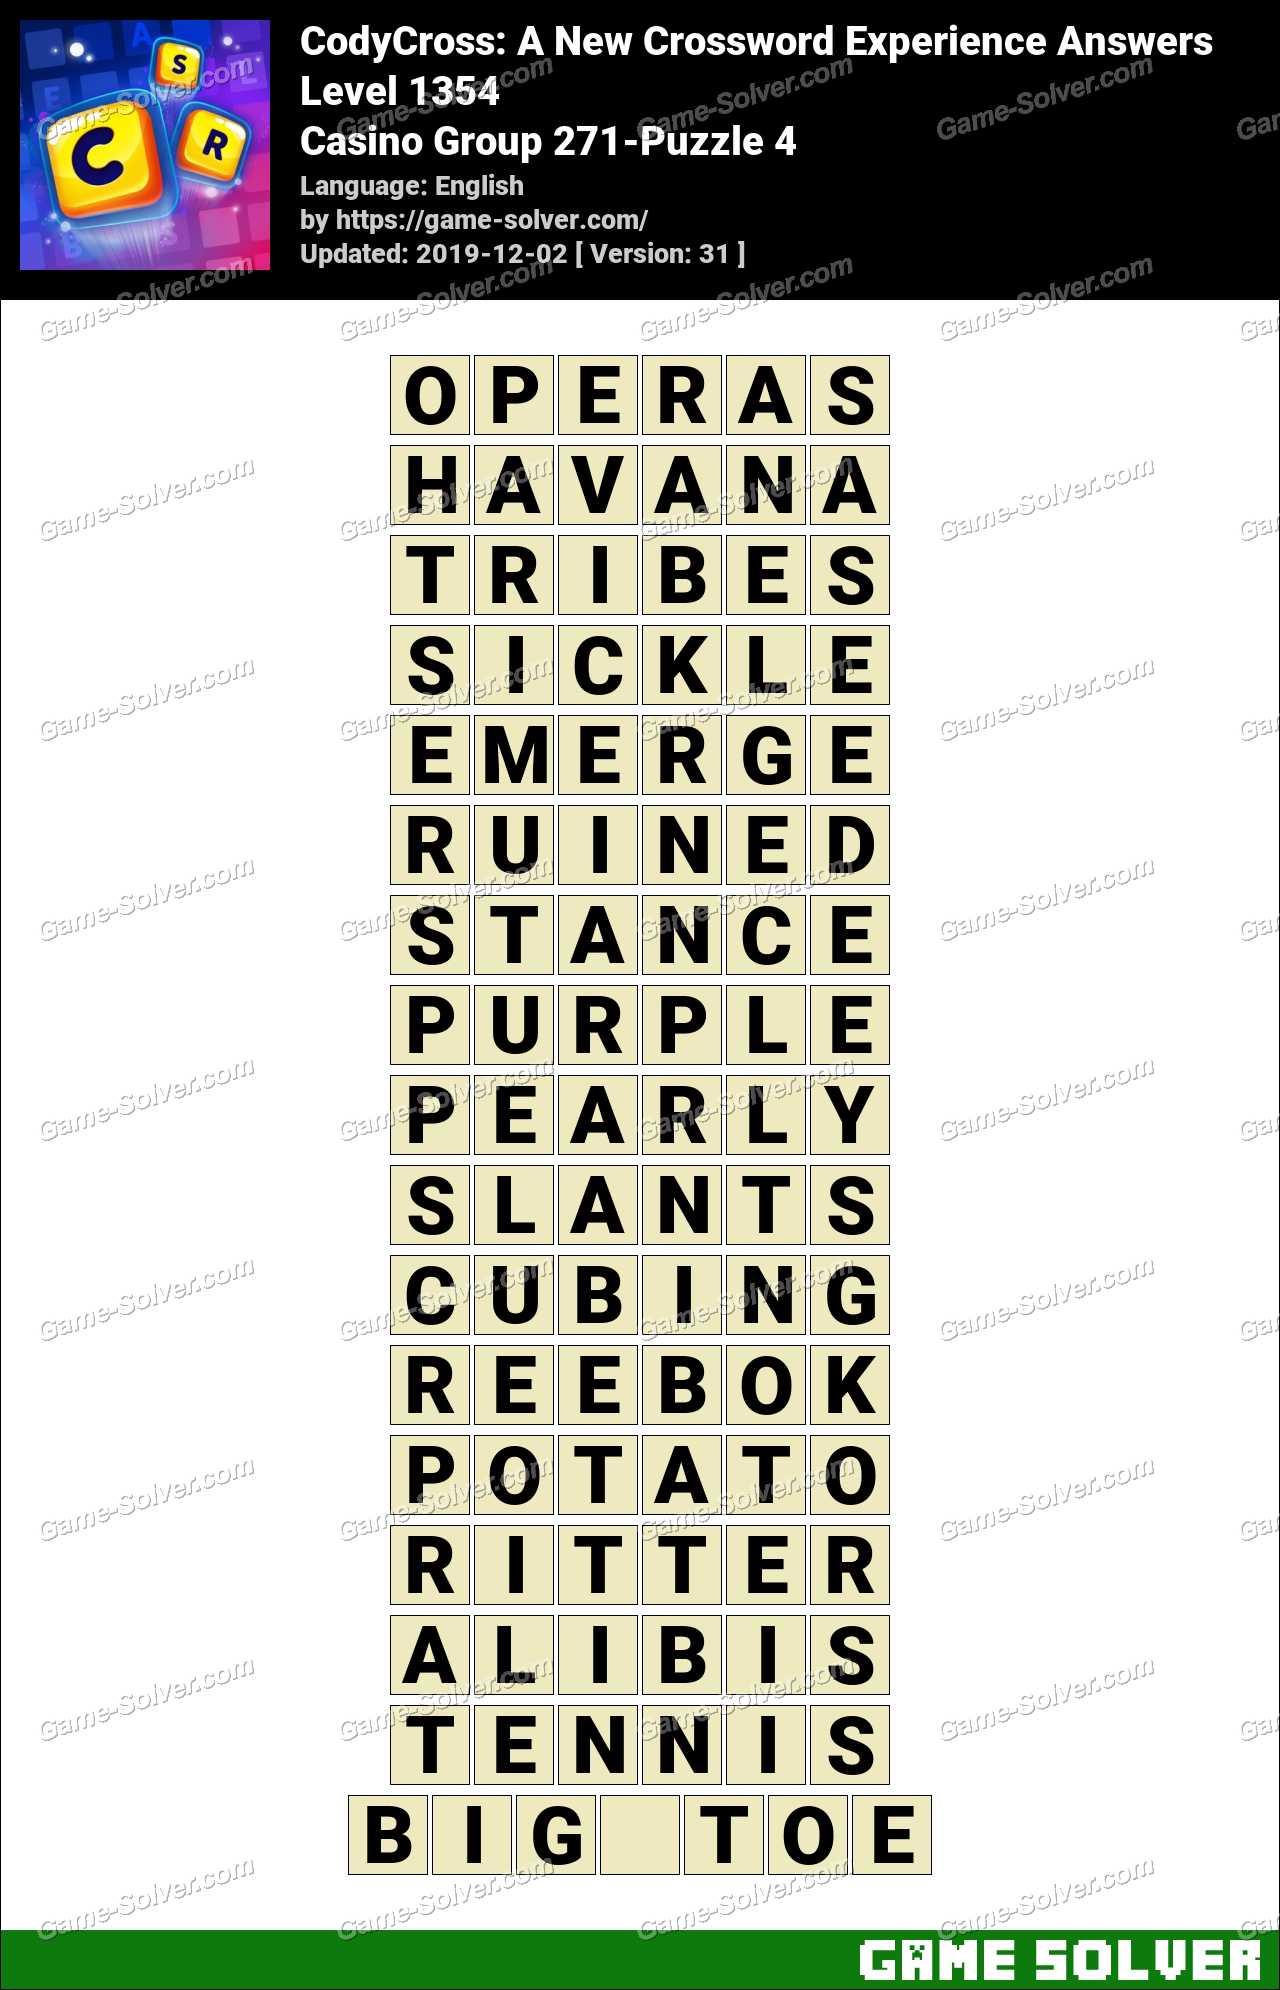 CodyCross Casino Group 271-Puzzle 4 Answers